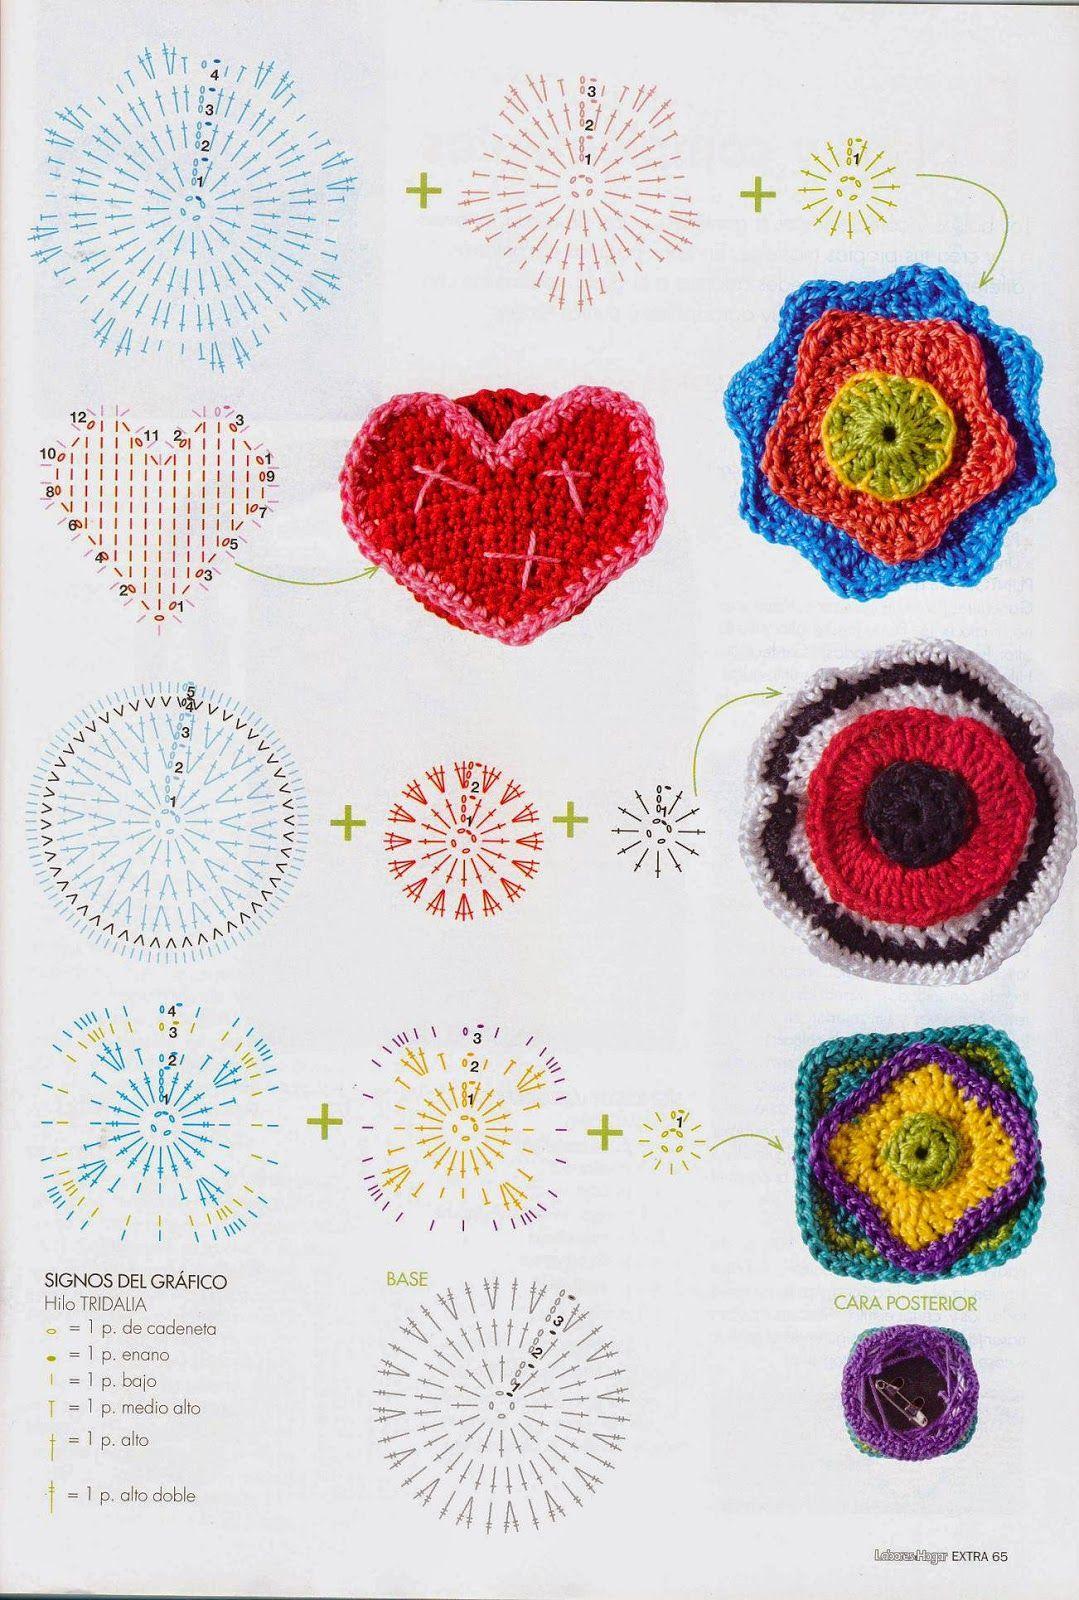 Revista de crochet moderna   crochet   Pinterest   Revistas, Moderno ...